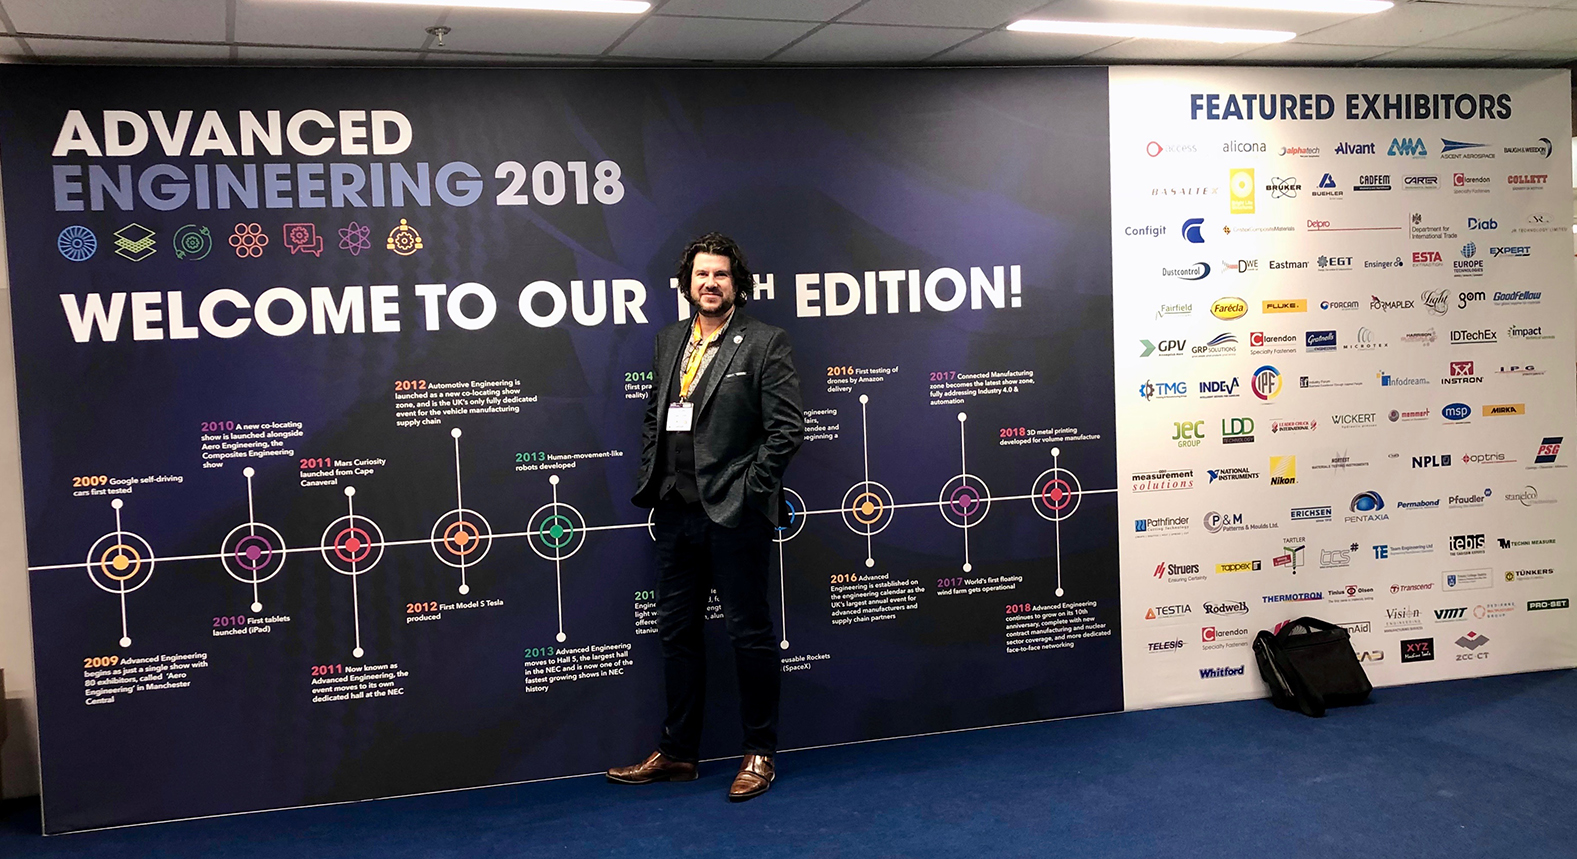 advance-engineering-show-2018